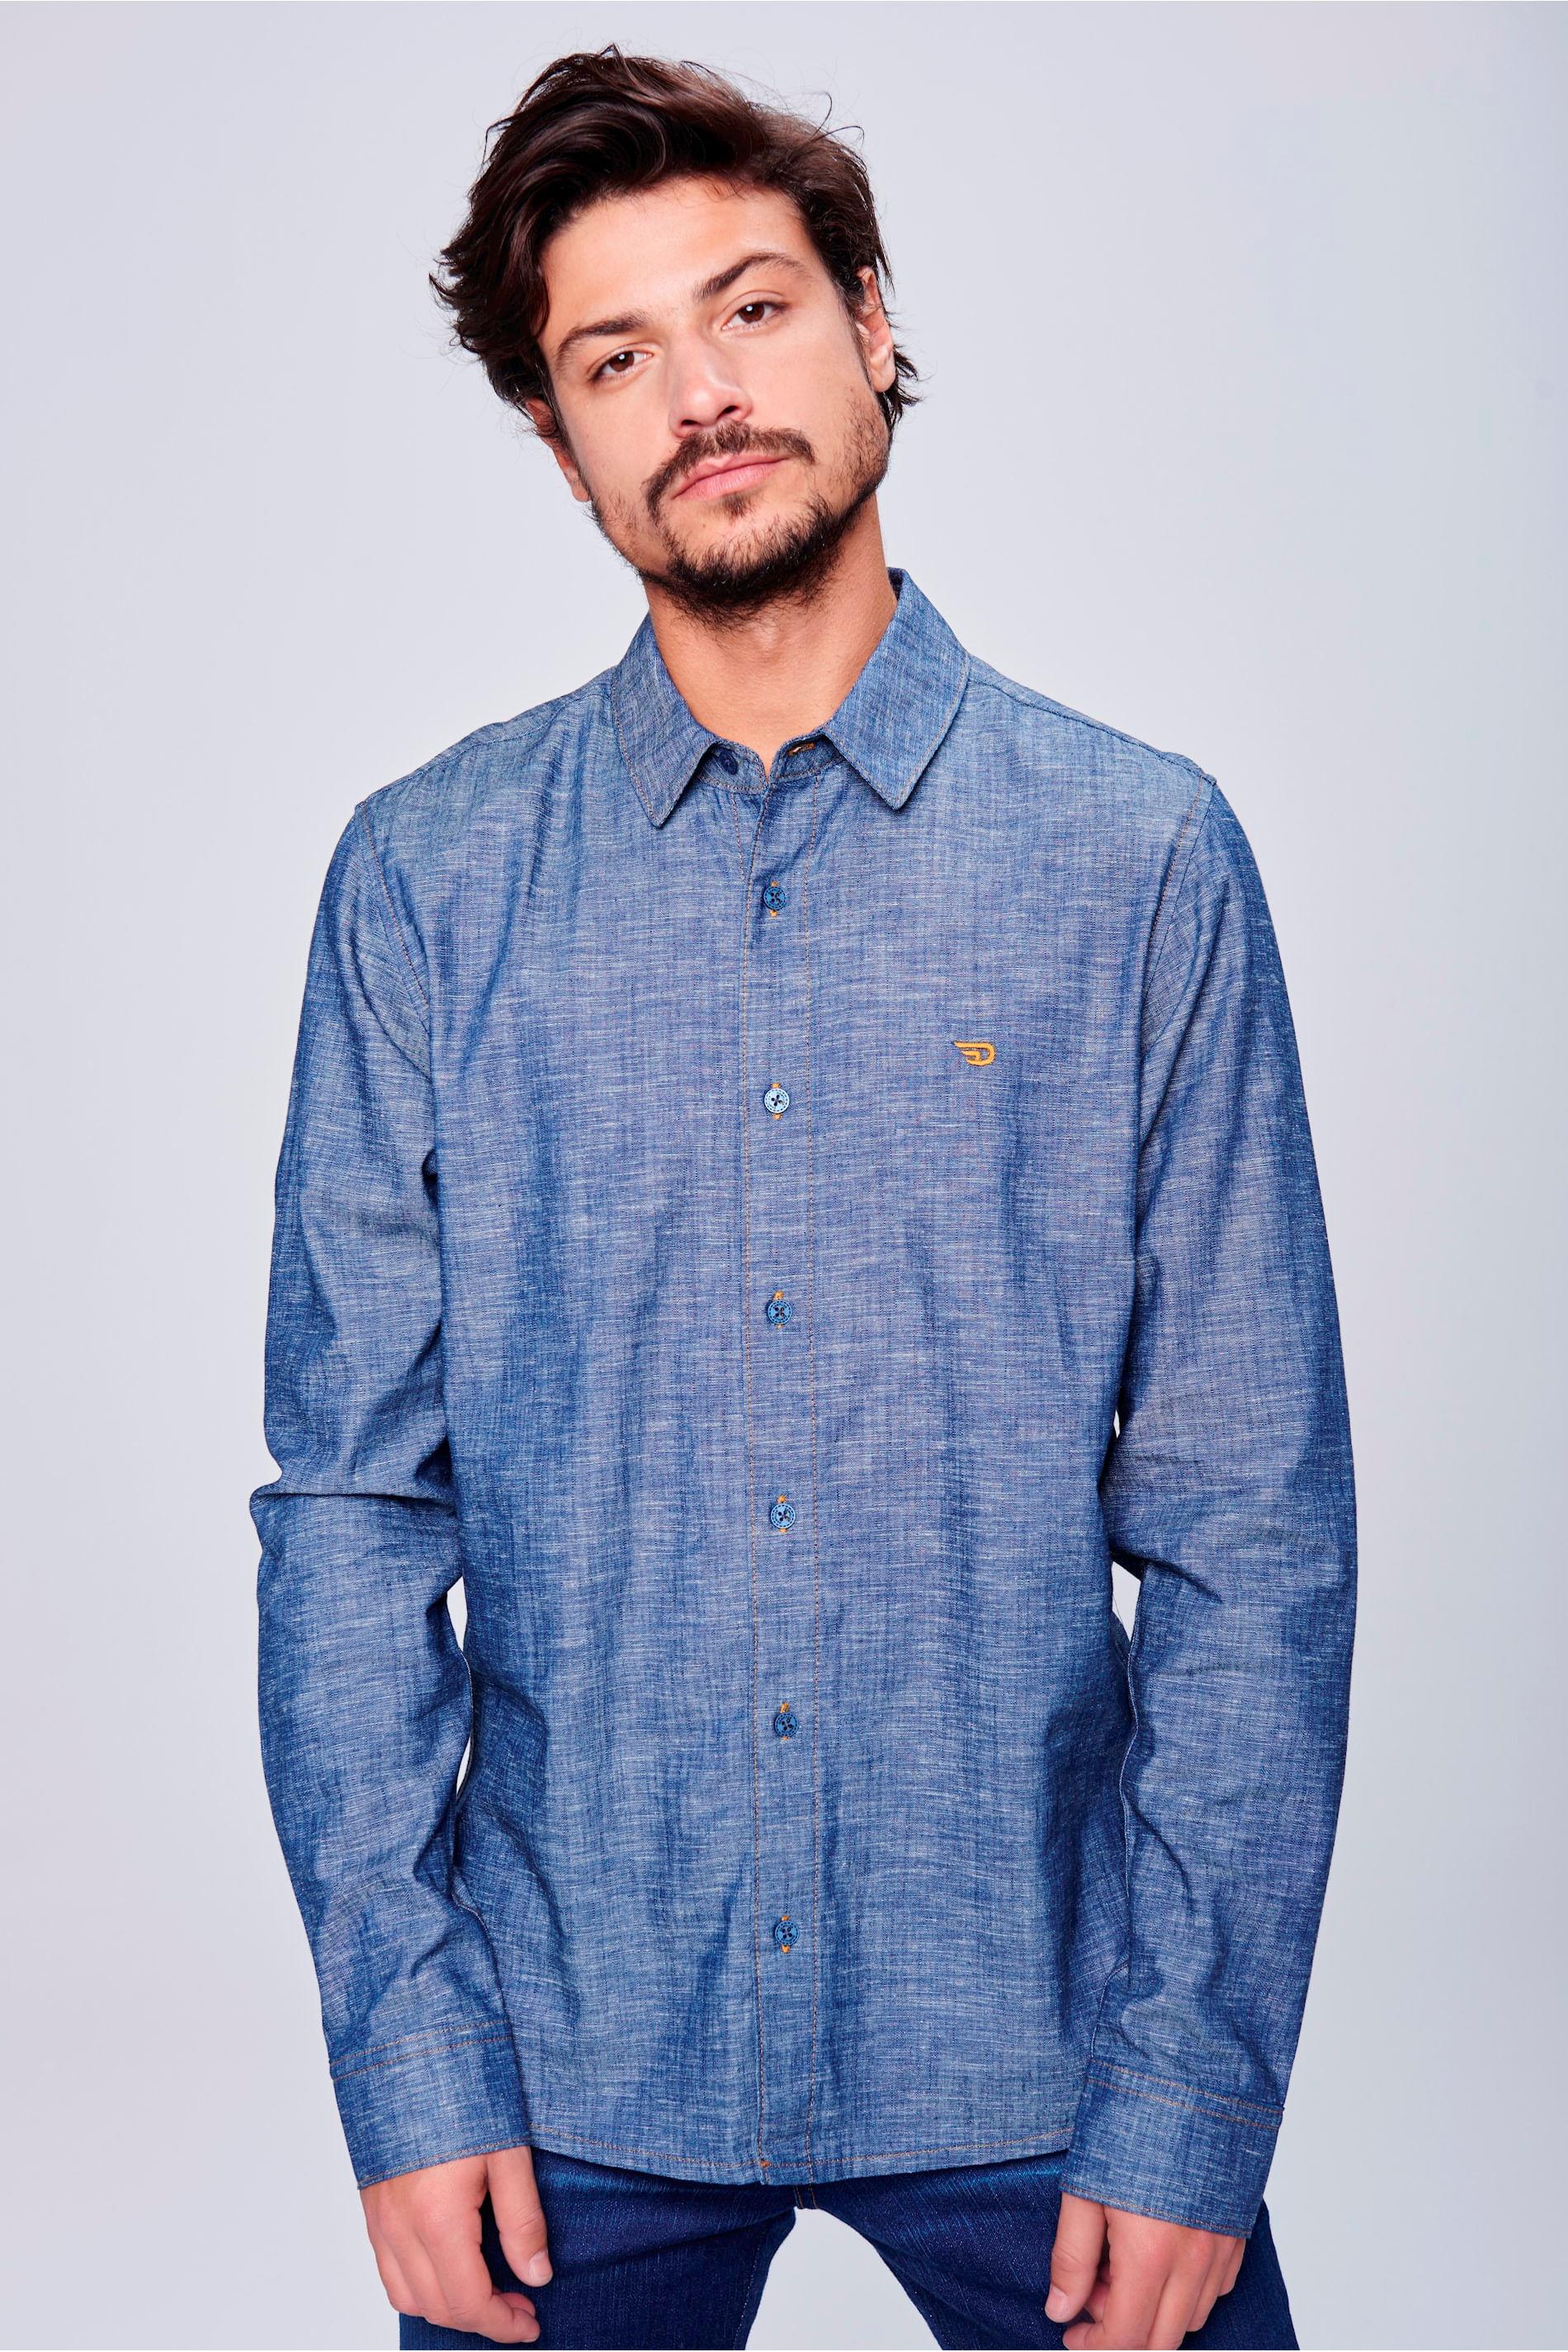 ac4f903cb0 Camisa Jeans Masculina Ecodamyller - Damyller